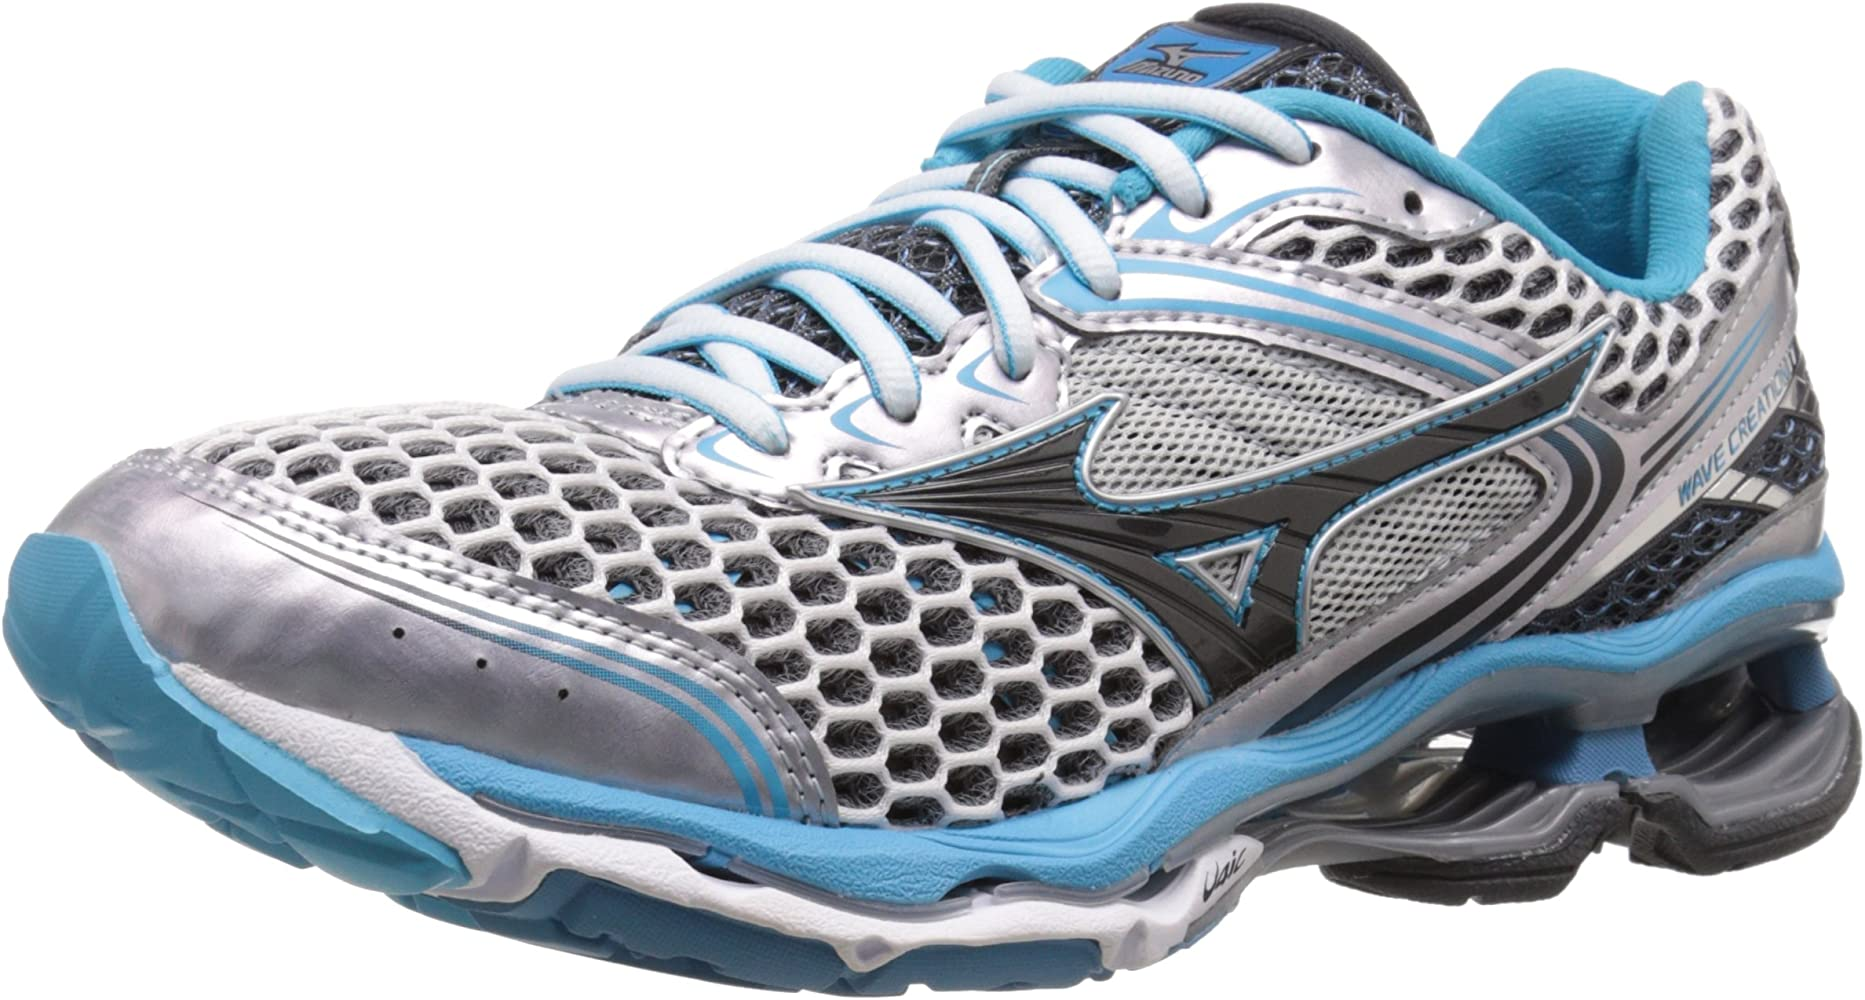 Mizuno - Wave Creation para mujer, zapatos deportivos para correr ...